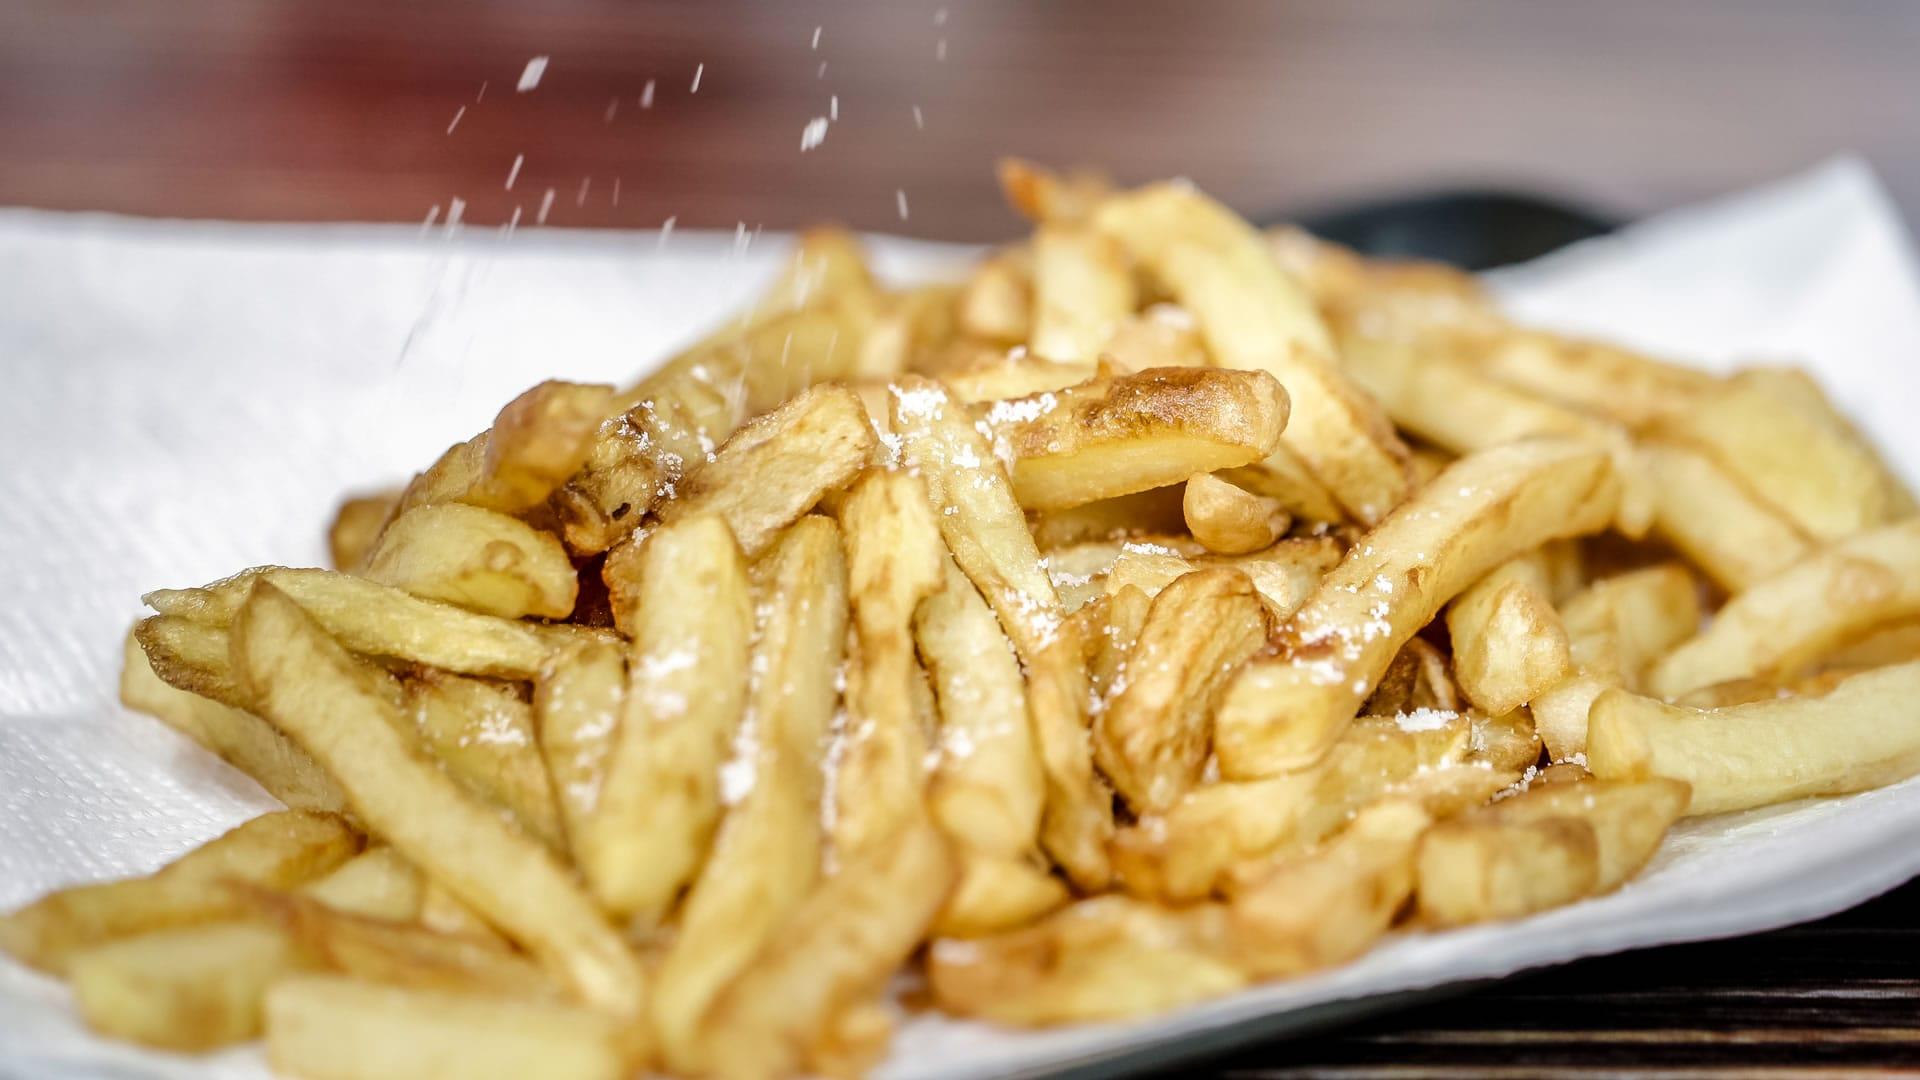 Patate fritte non fritte al microonde